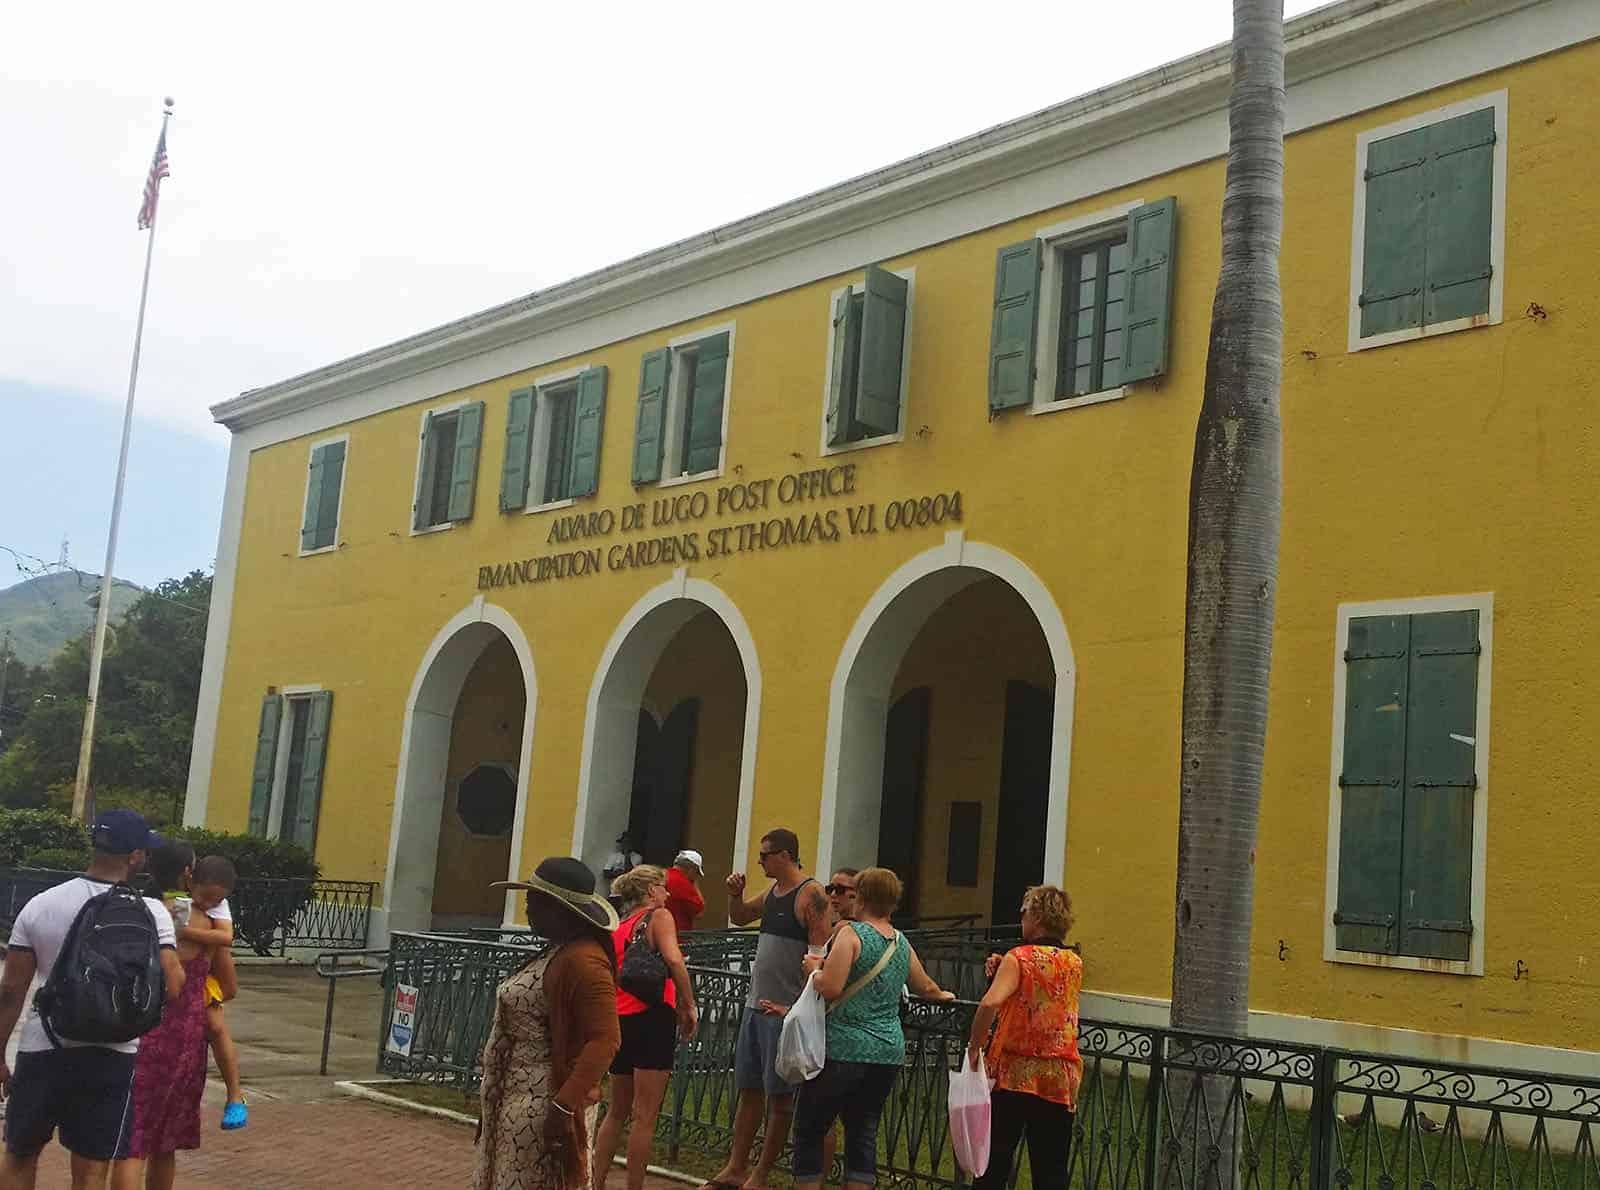 Post Office - Downtown Charlotte Amalie, St. Thomas